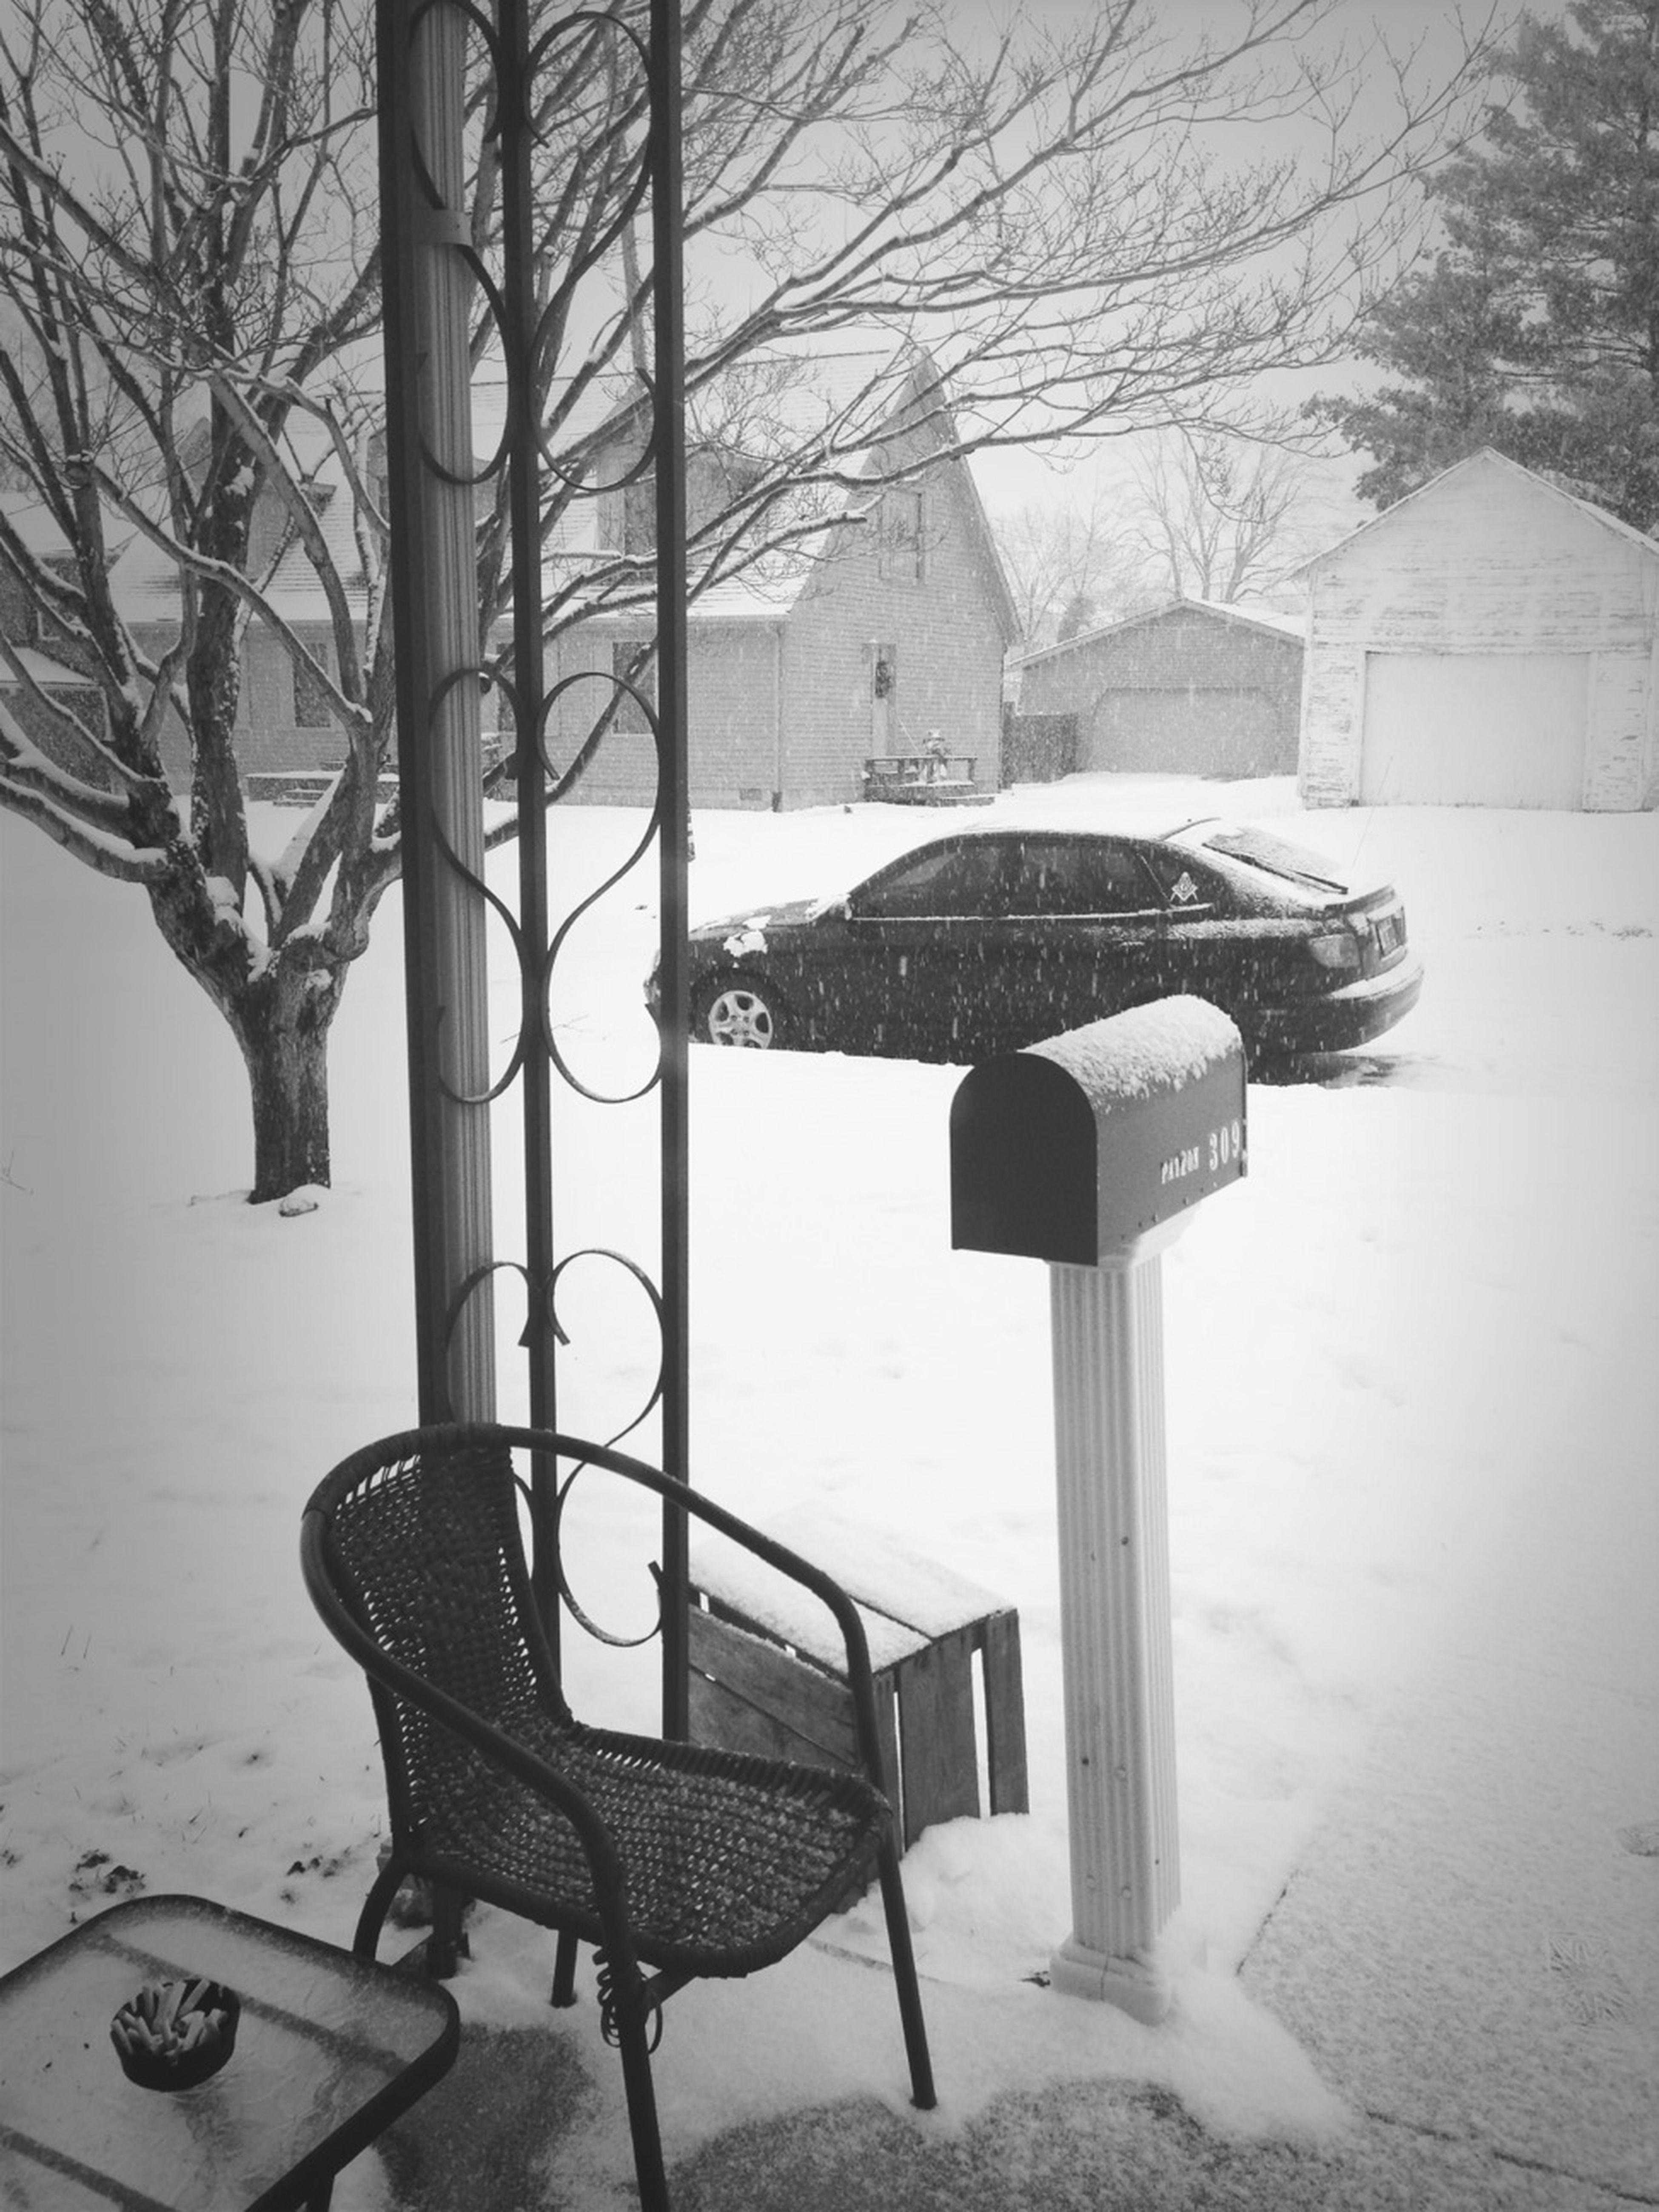 Loving This Snow